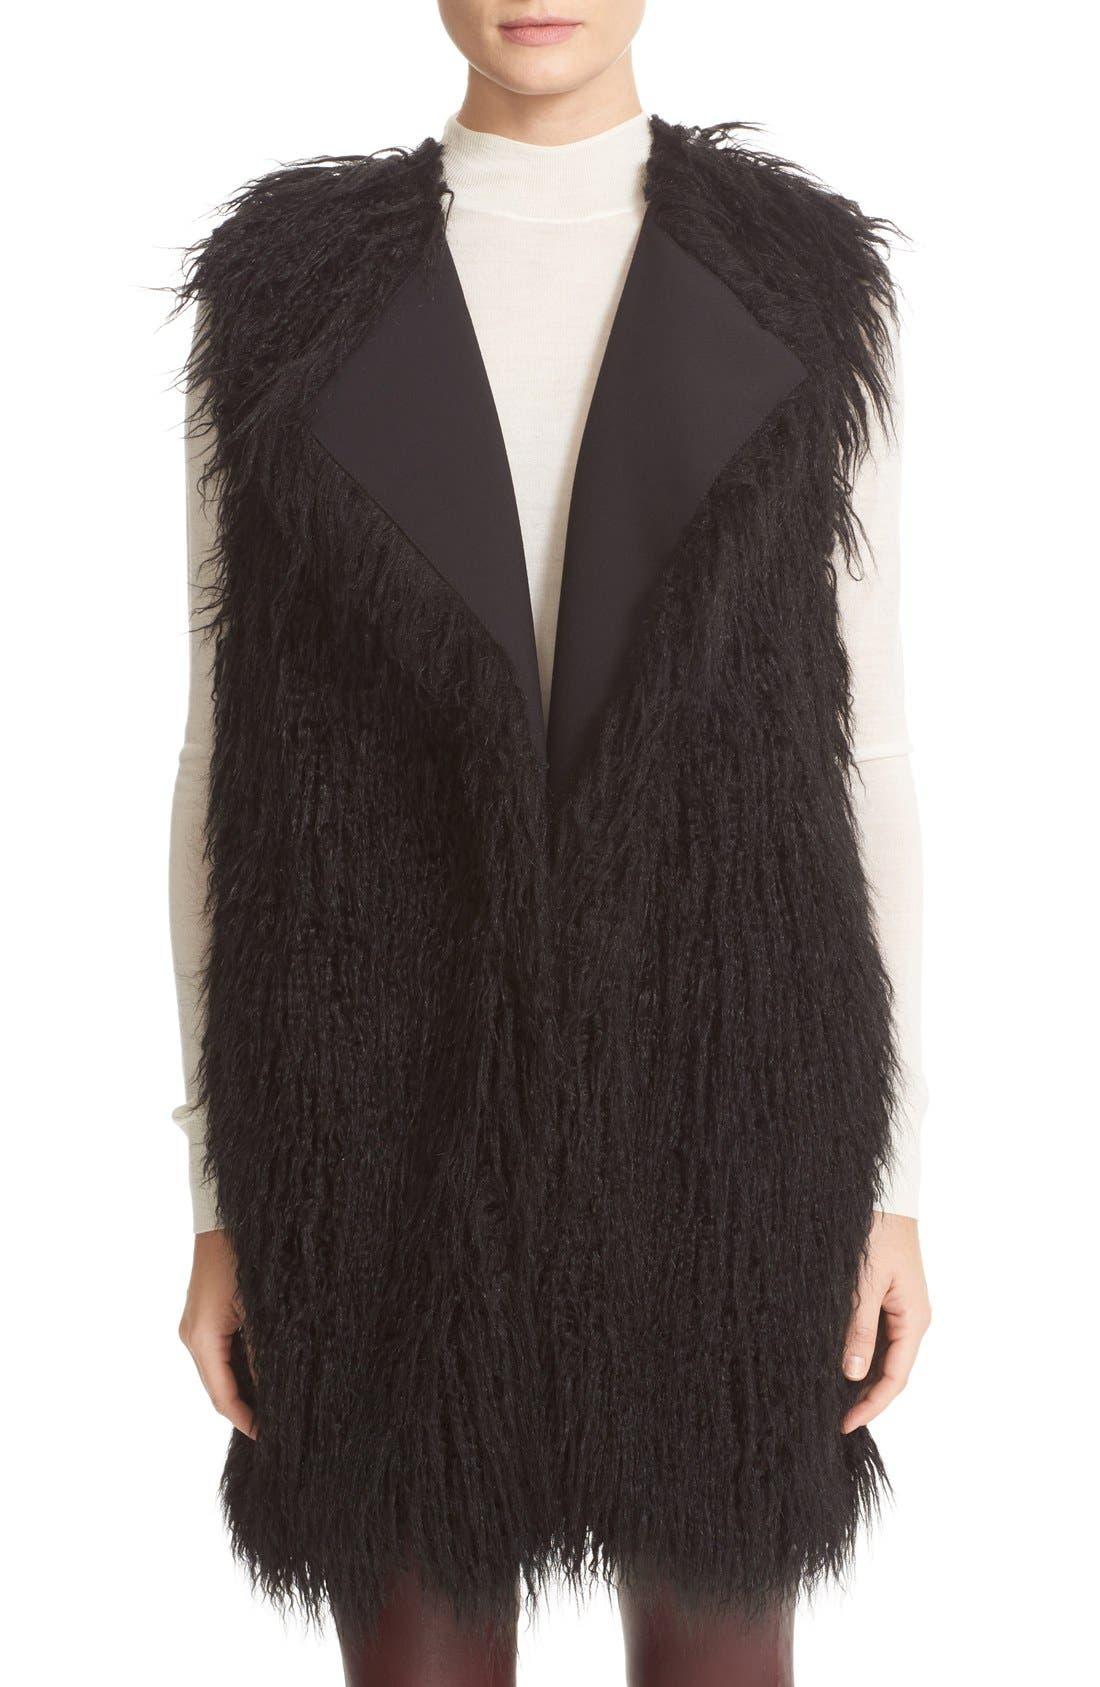 Nyma V Cody Shaggy Faux Fur Front Long Vest, Main, color, 001